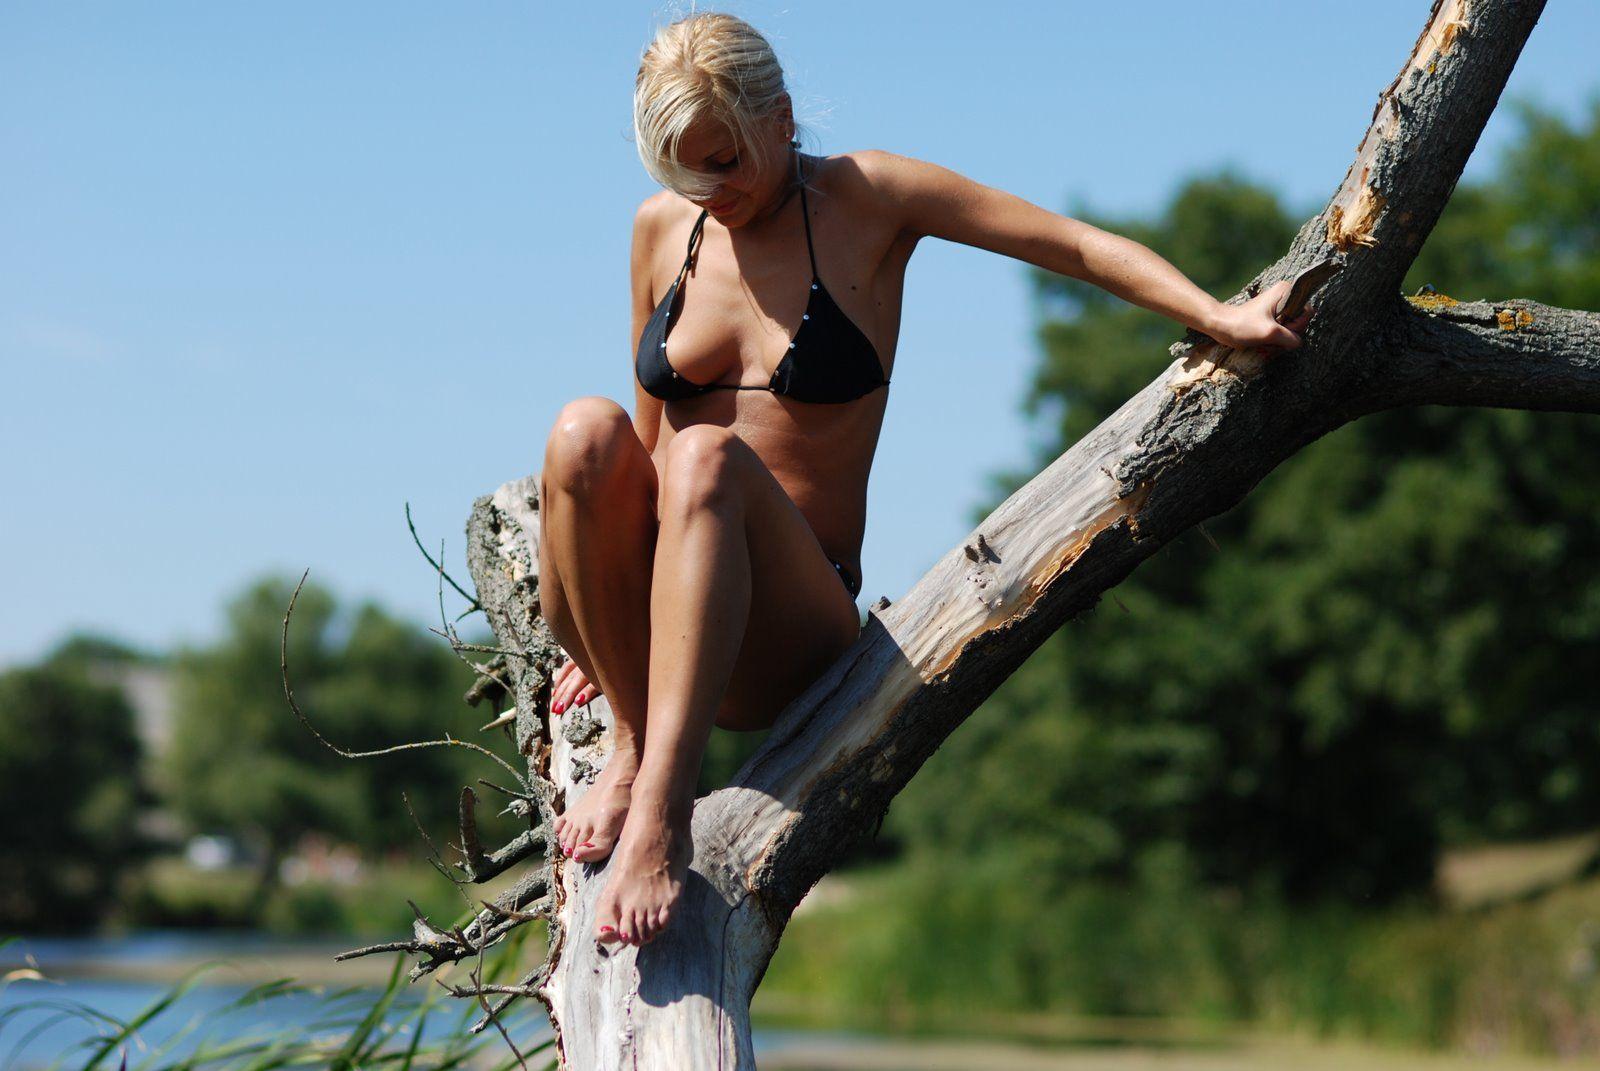 Bikini photos russian love the Doukhobors